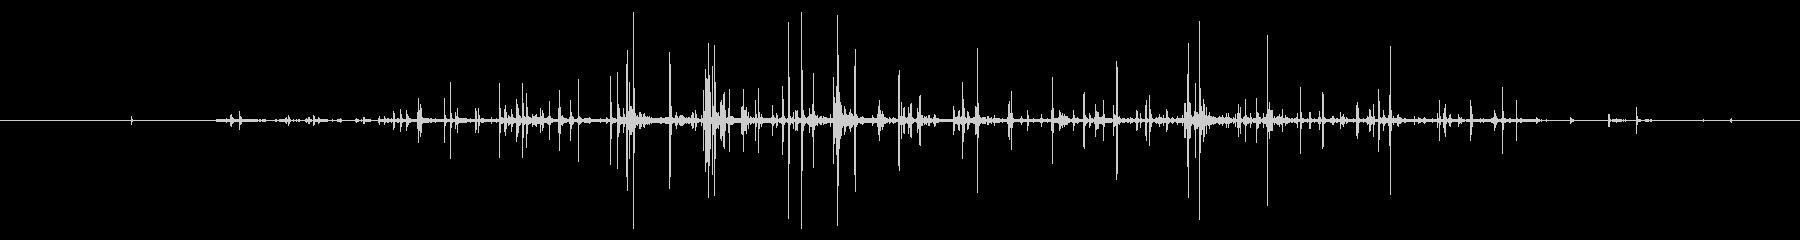 Gasa Sagasa Ear Wased Sound 02's unreproduced waveform